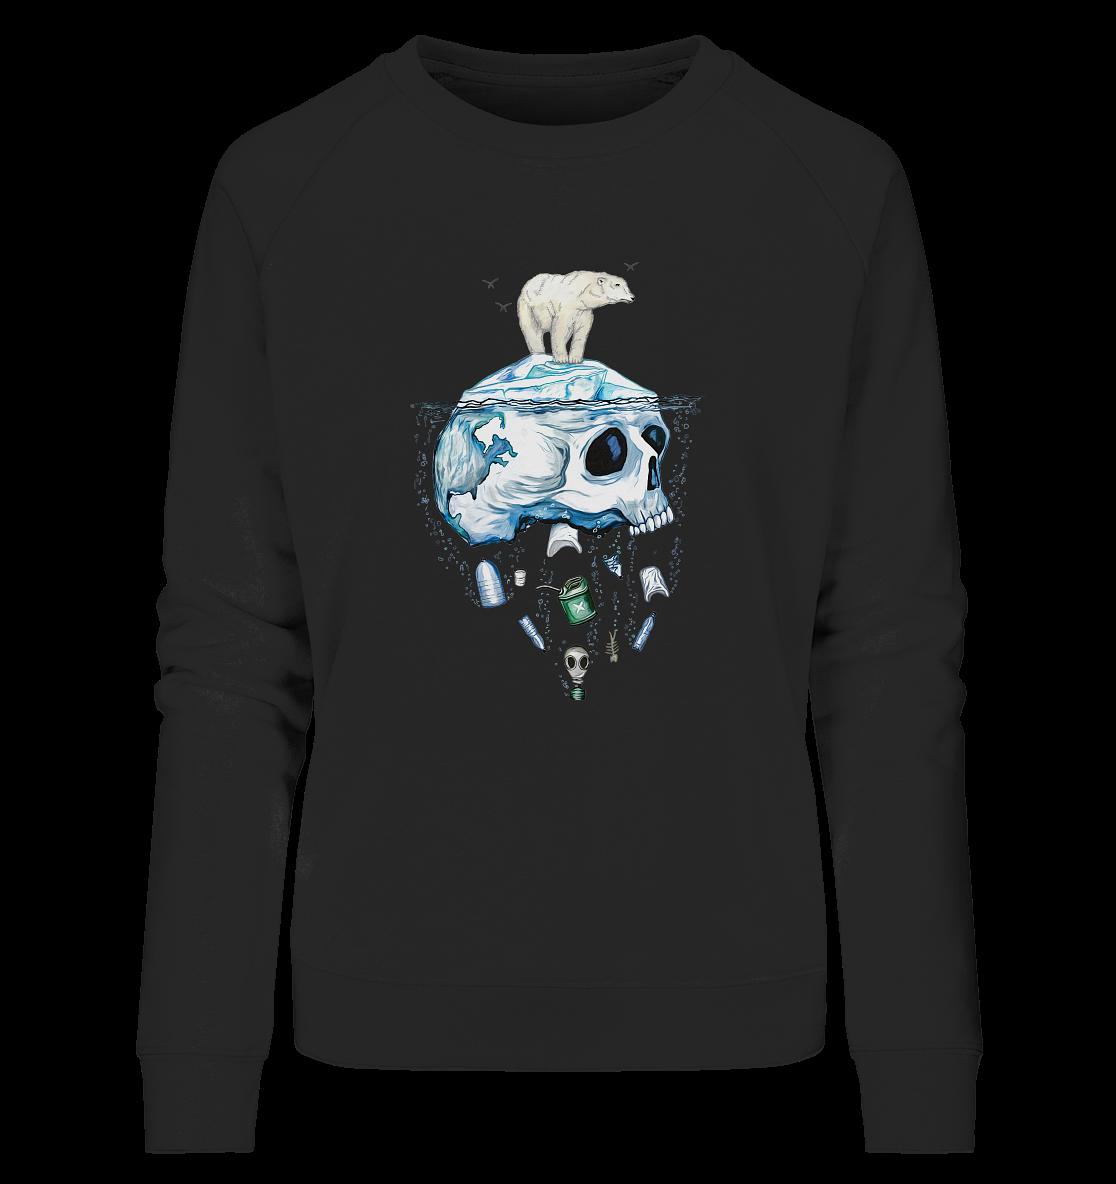 front-ladies-organic-sweatshirt-272727-1116x.png